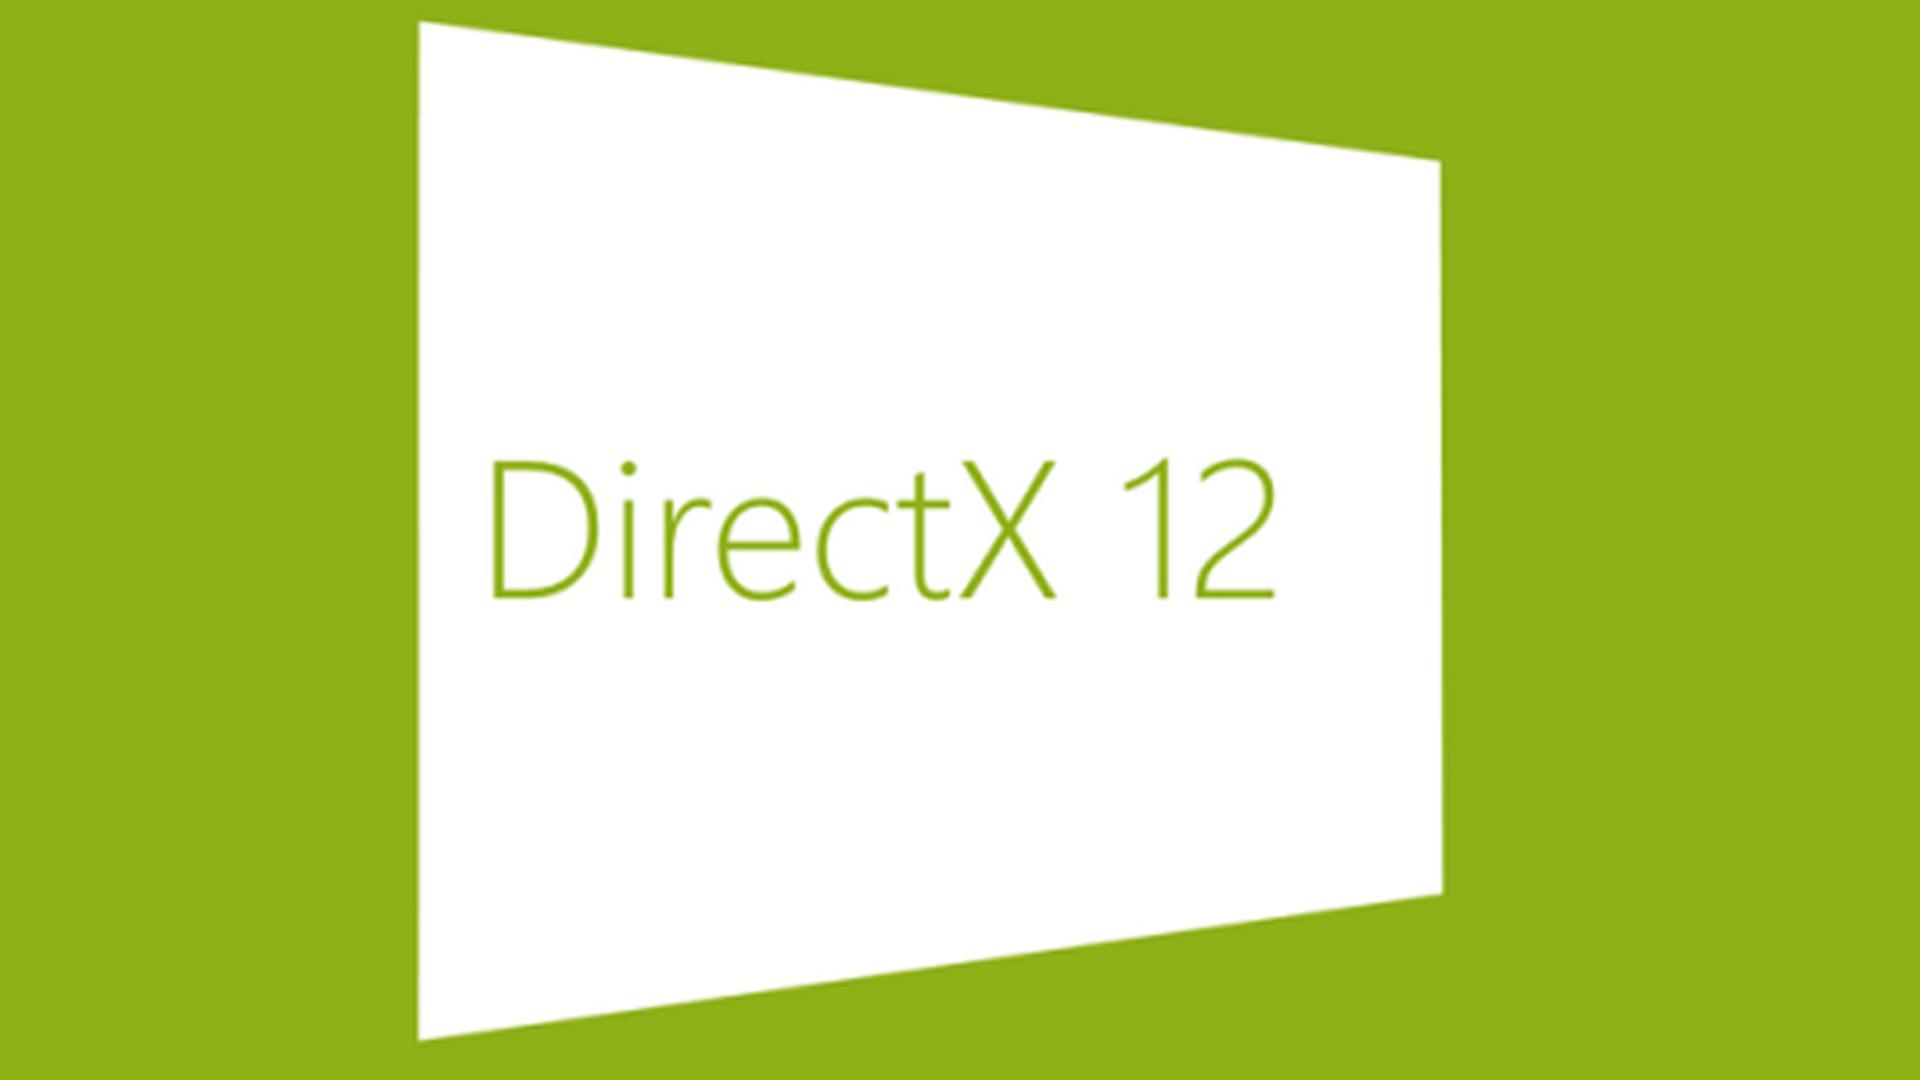 DirectX-12